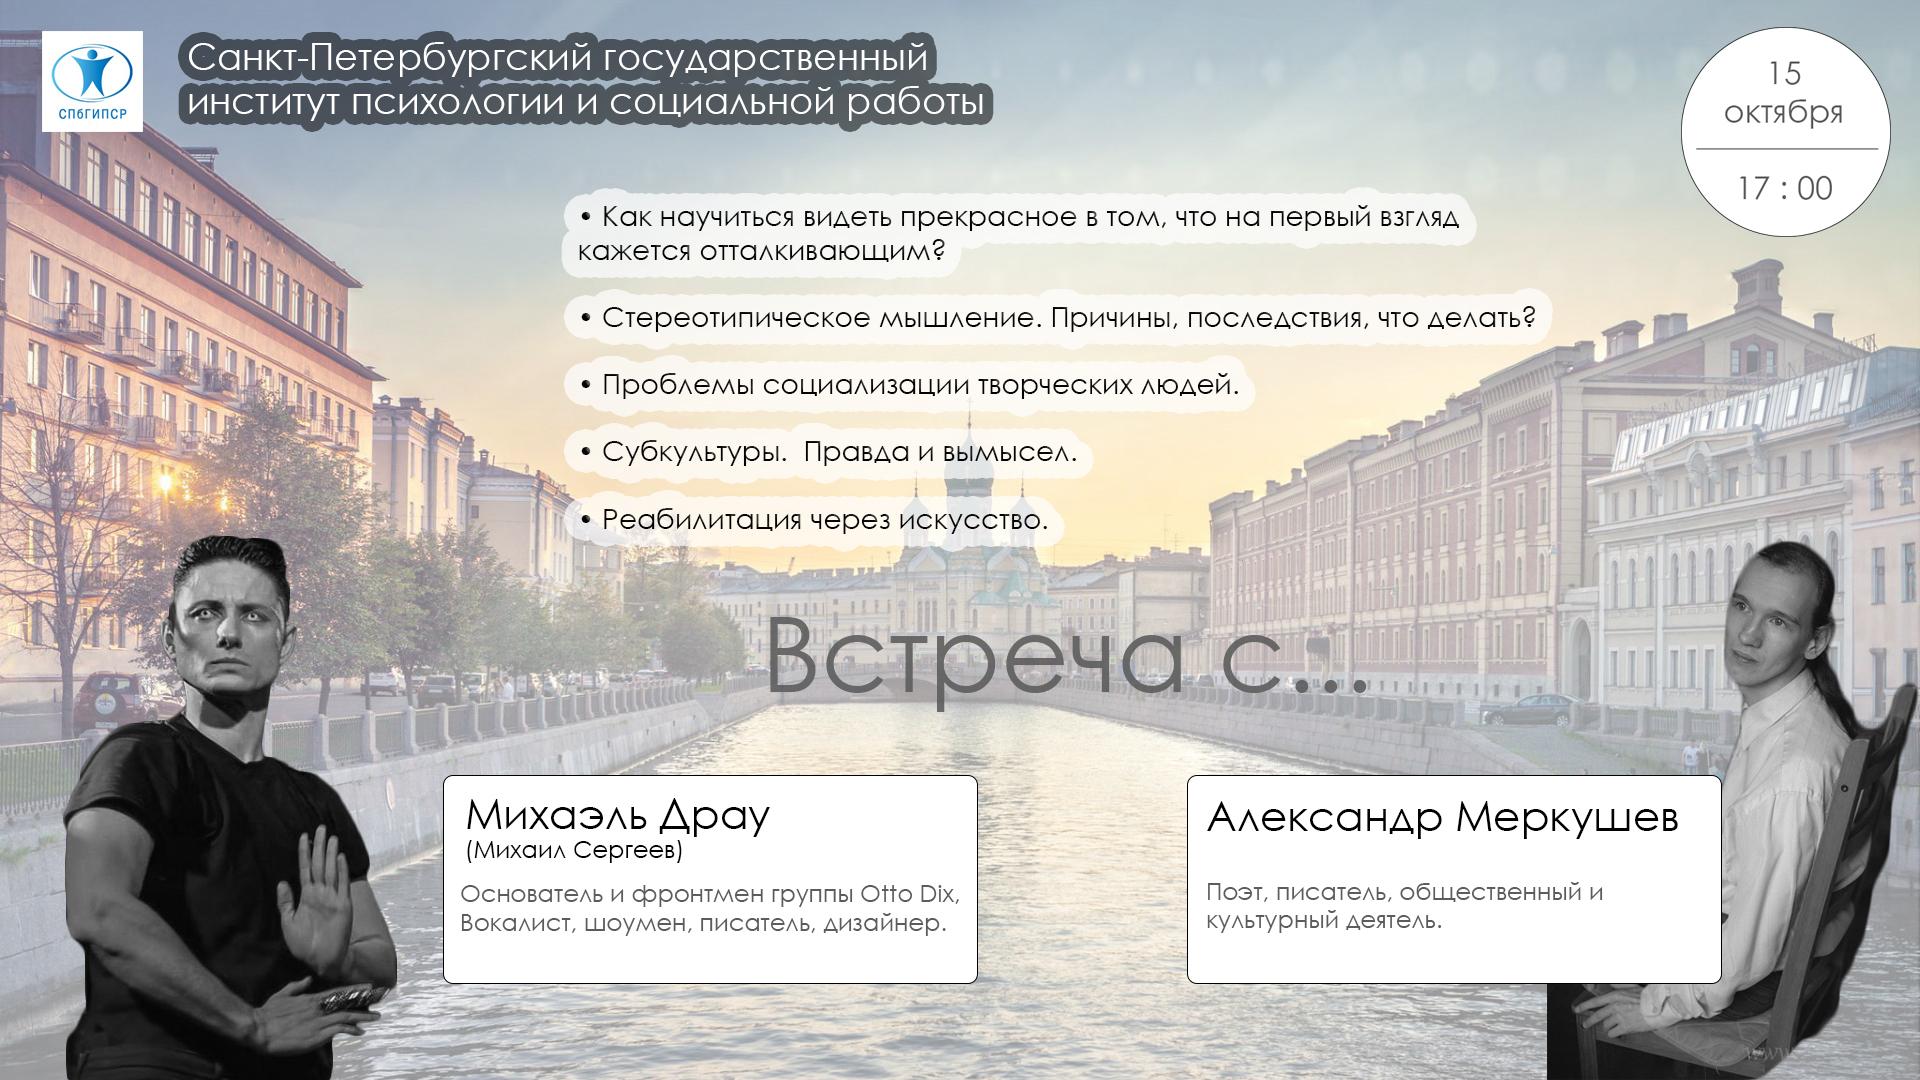 Михаэль Драу и поэт Александр Меркушев